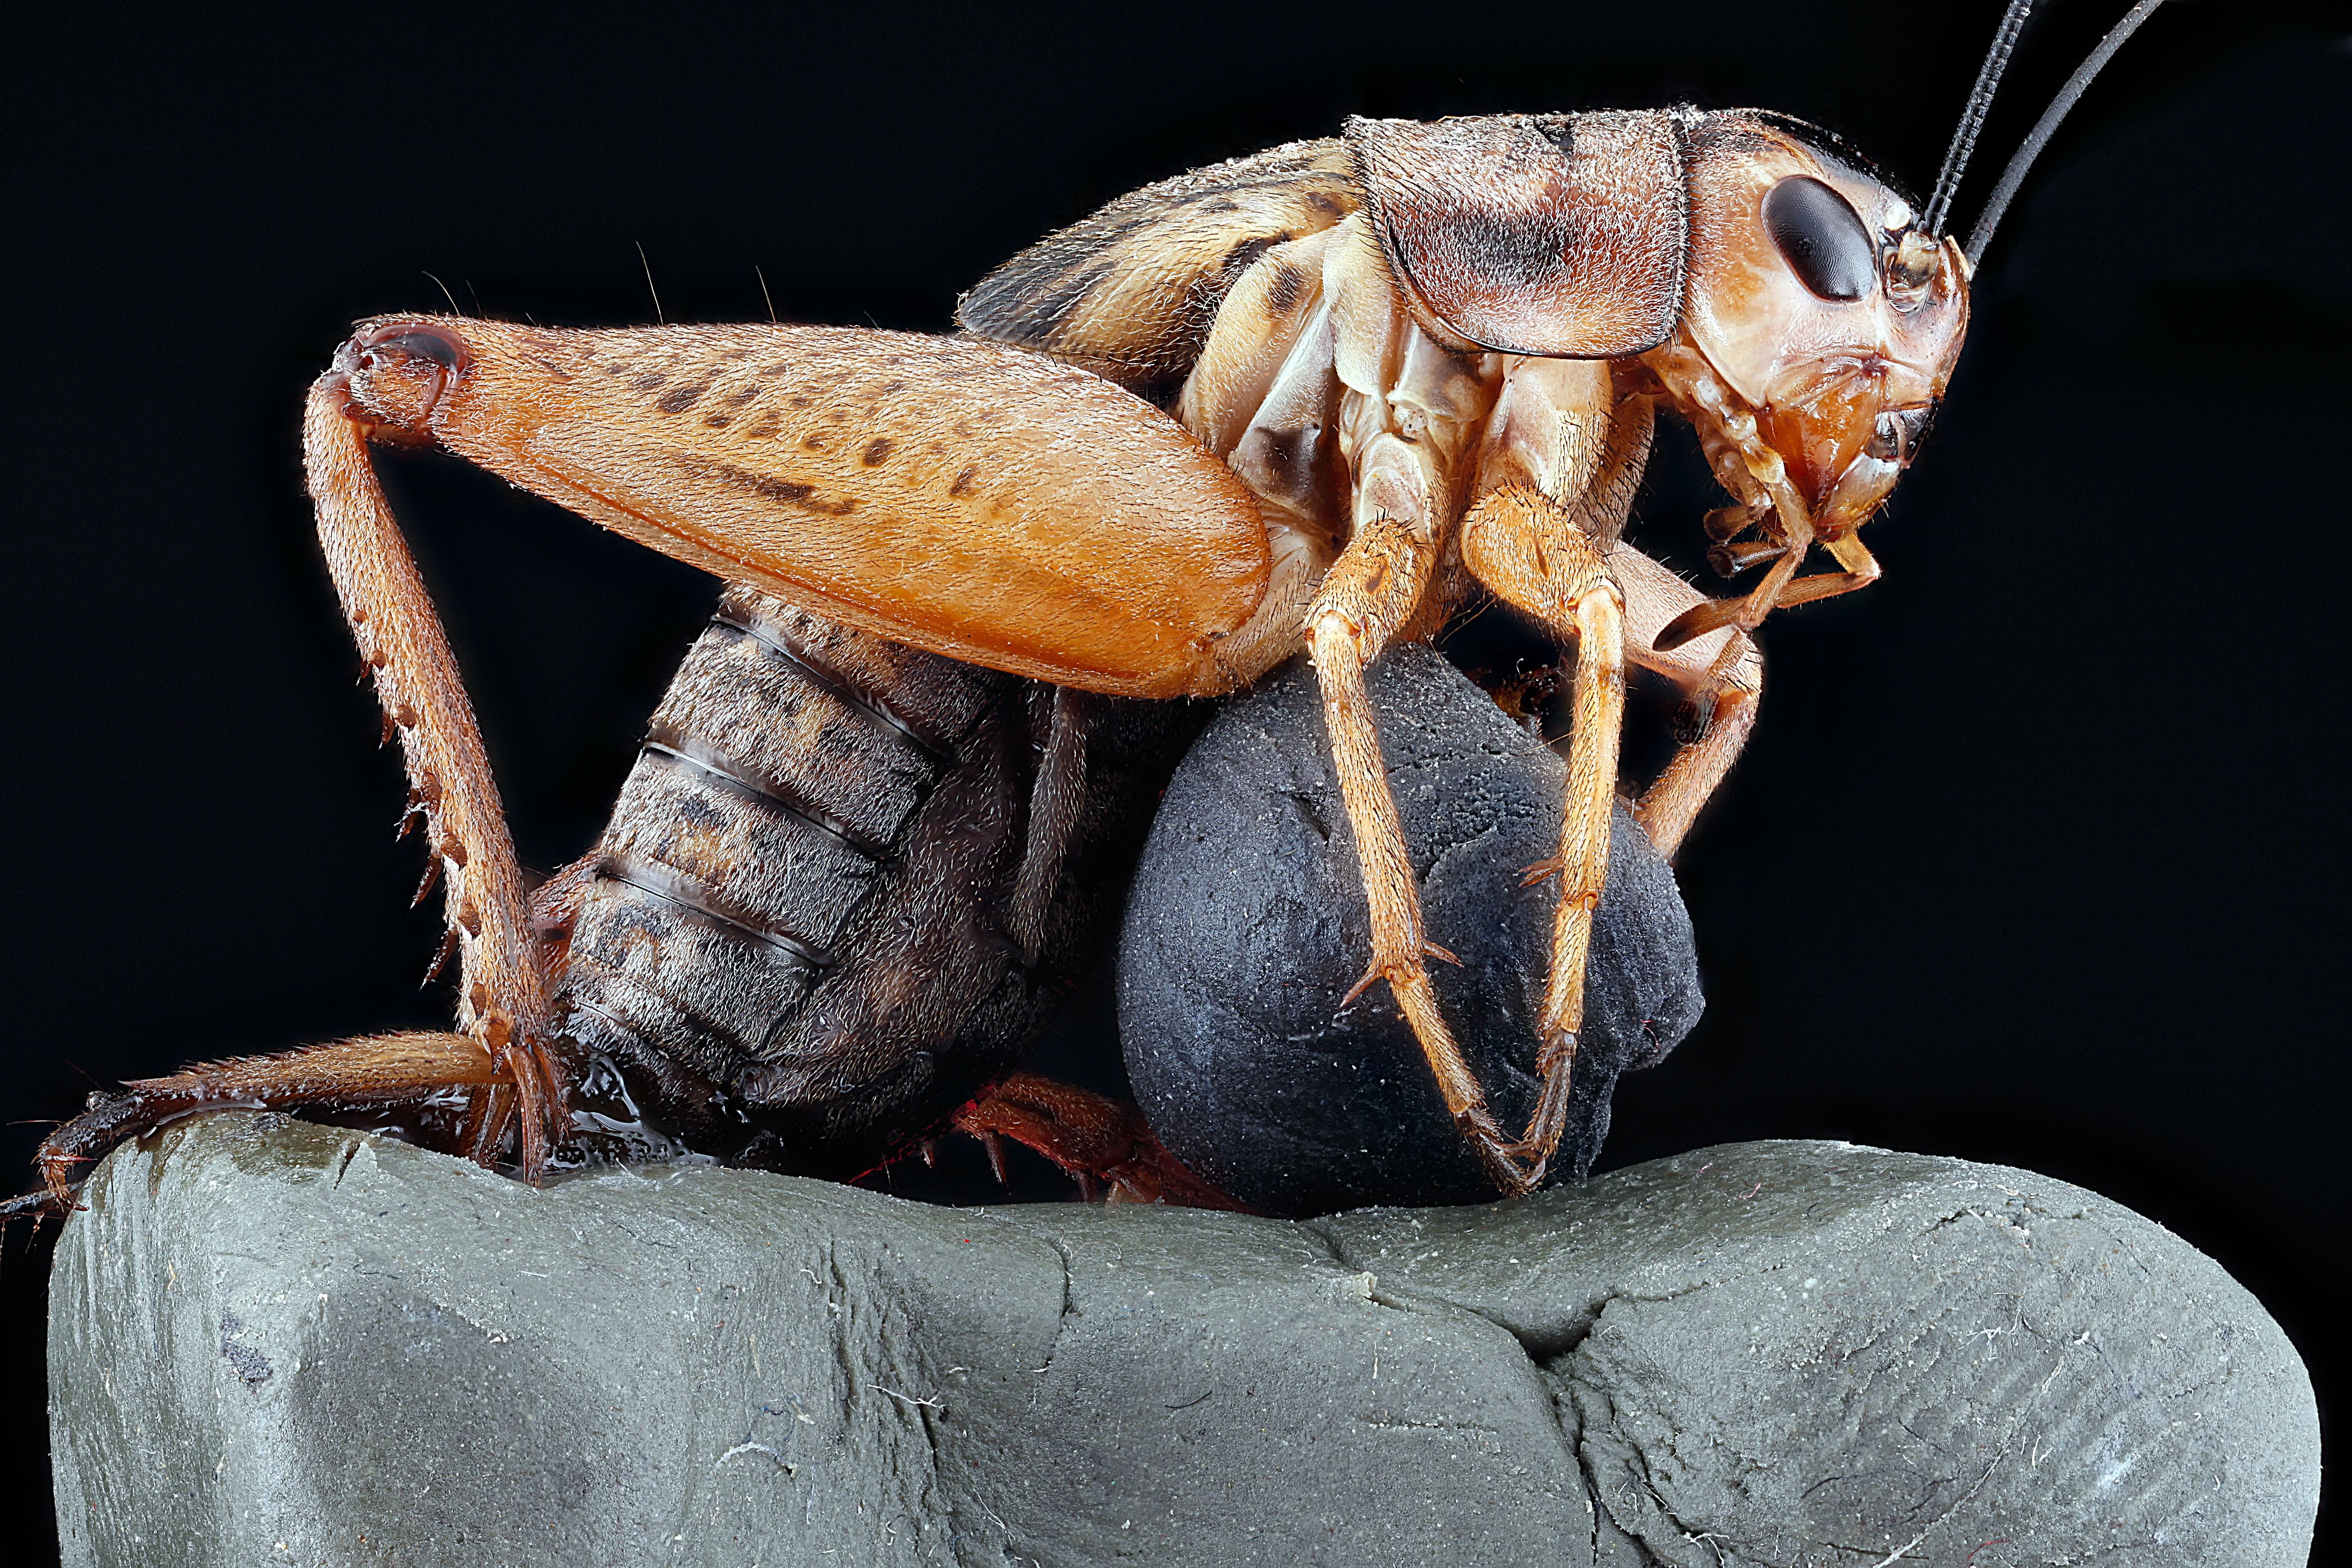 Интересни факти за хлебарката, които не знаете